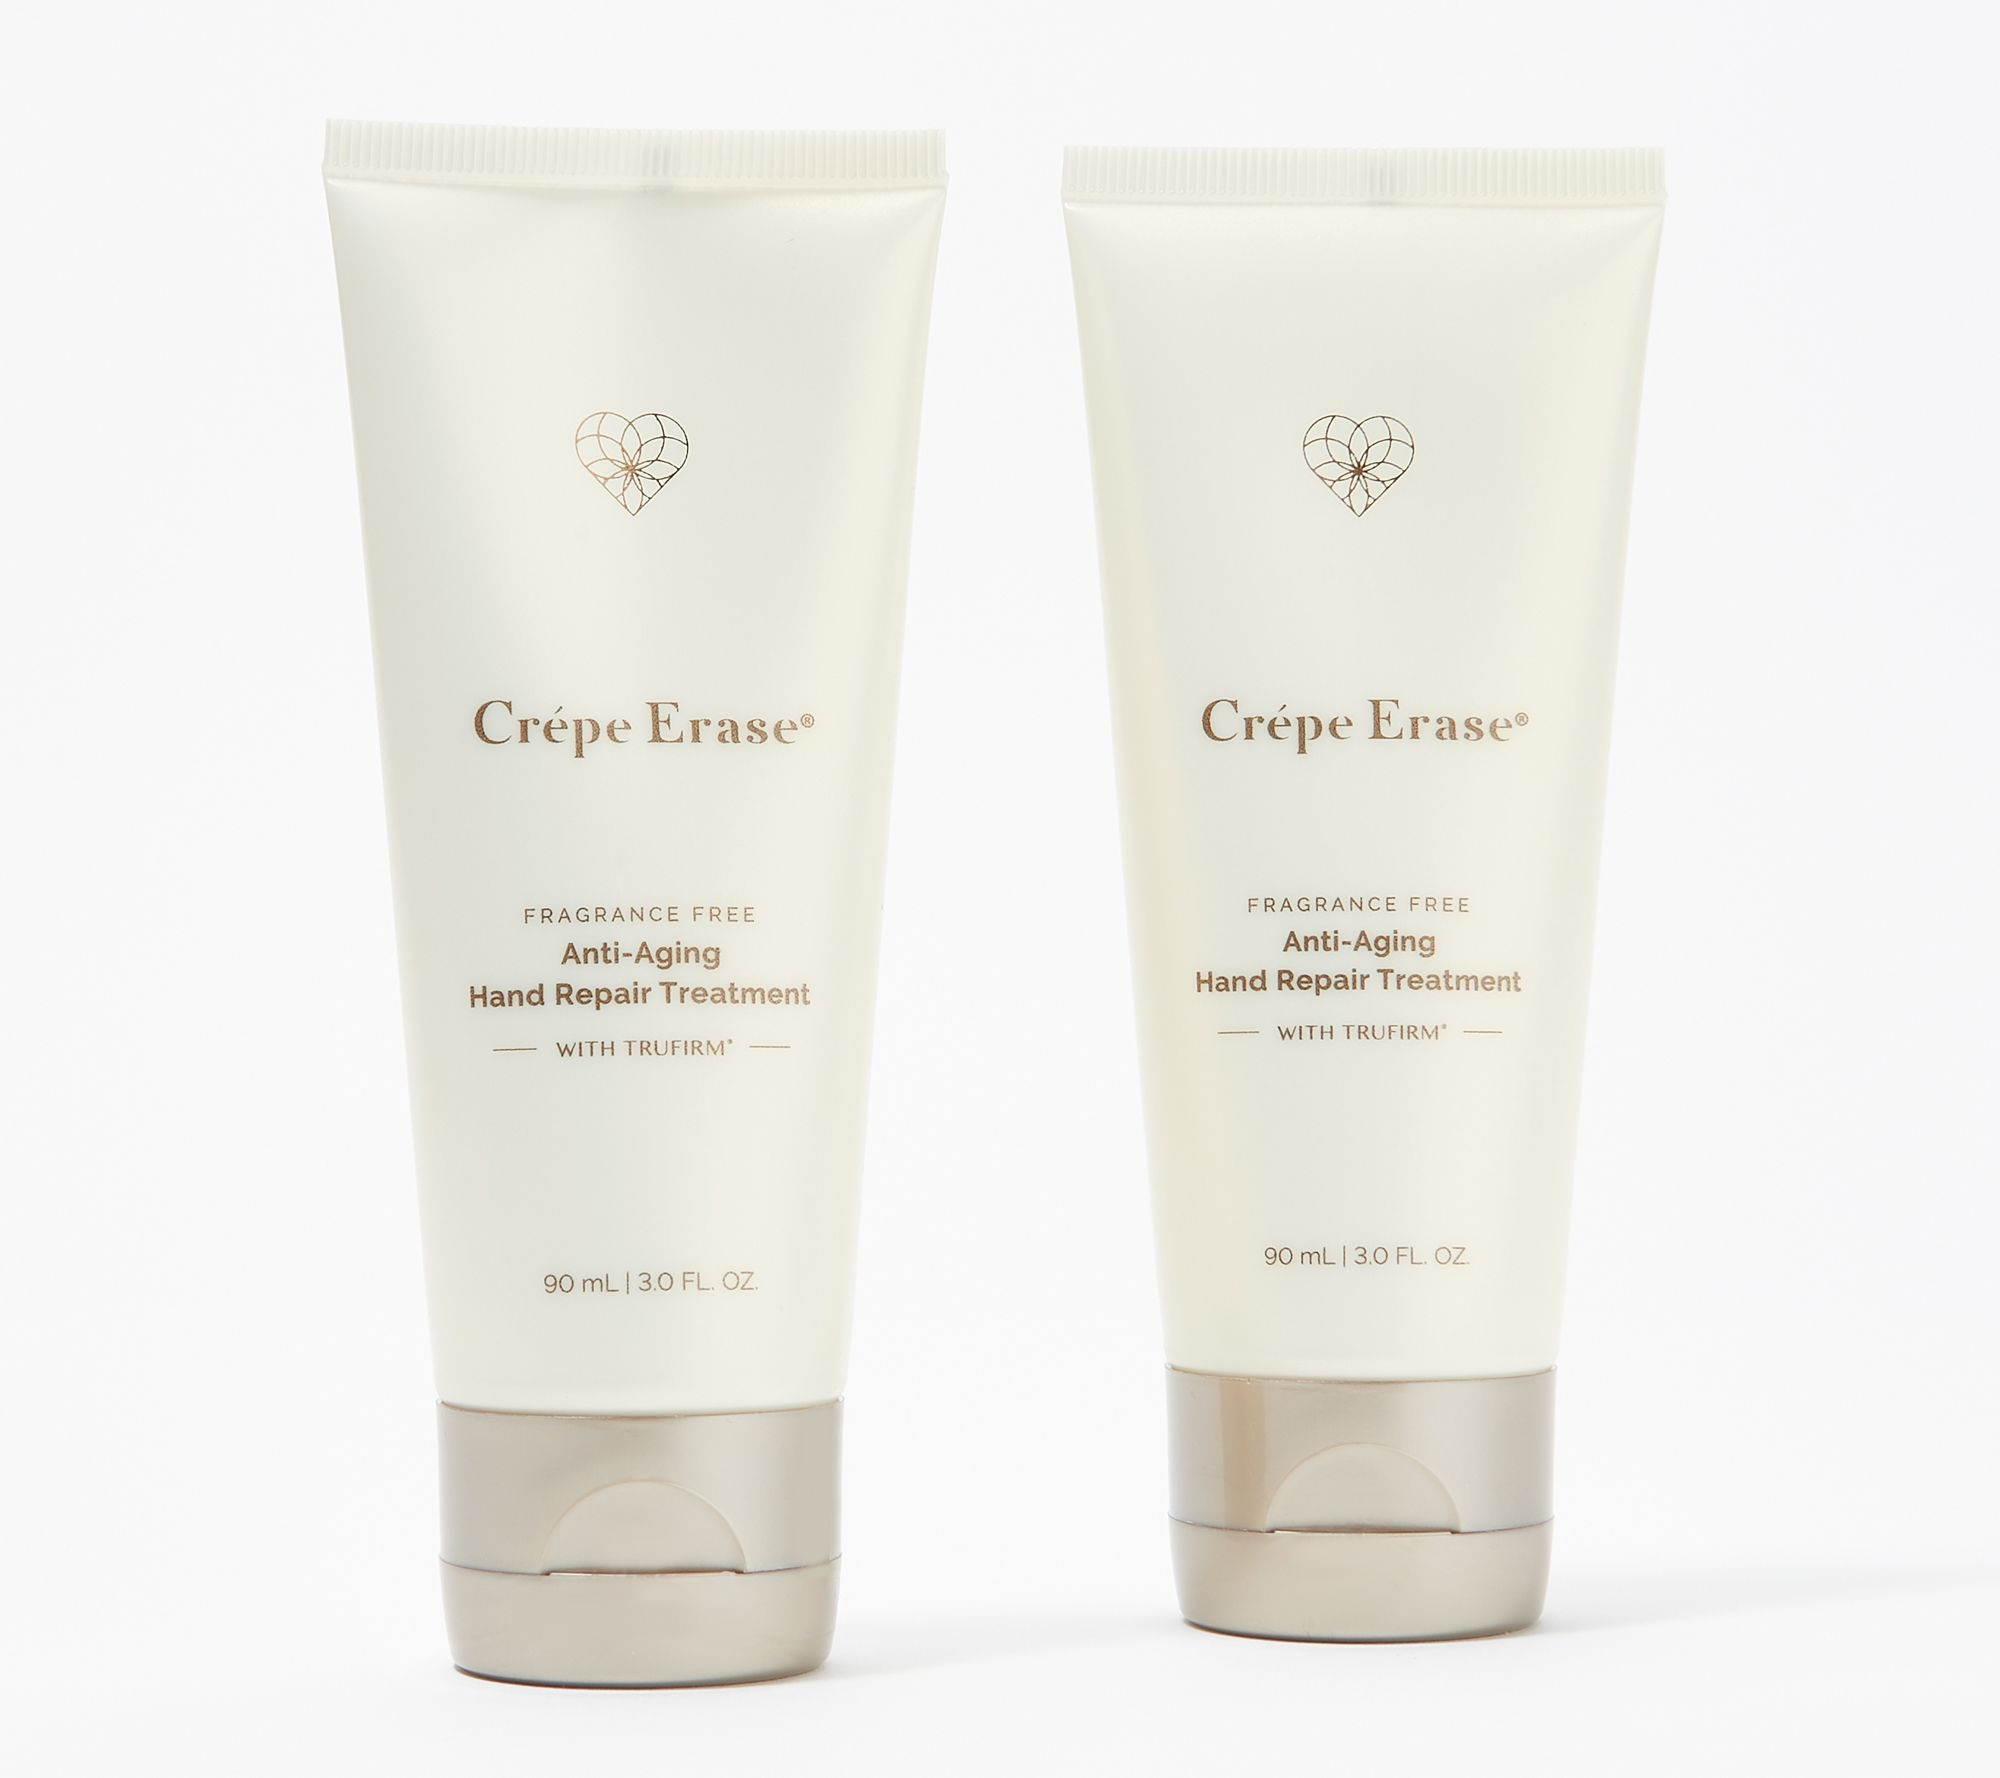 Crepe Erase Anti Aging Hand Repair Treatment Duo Qvc Com